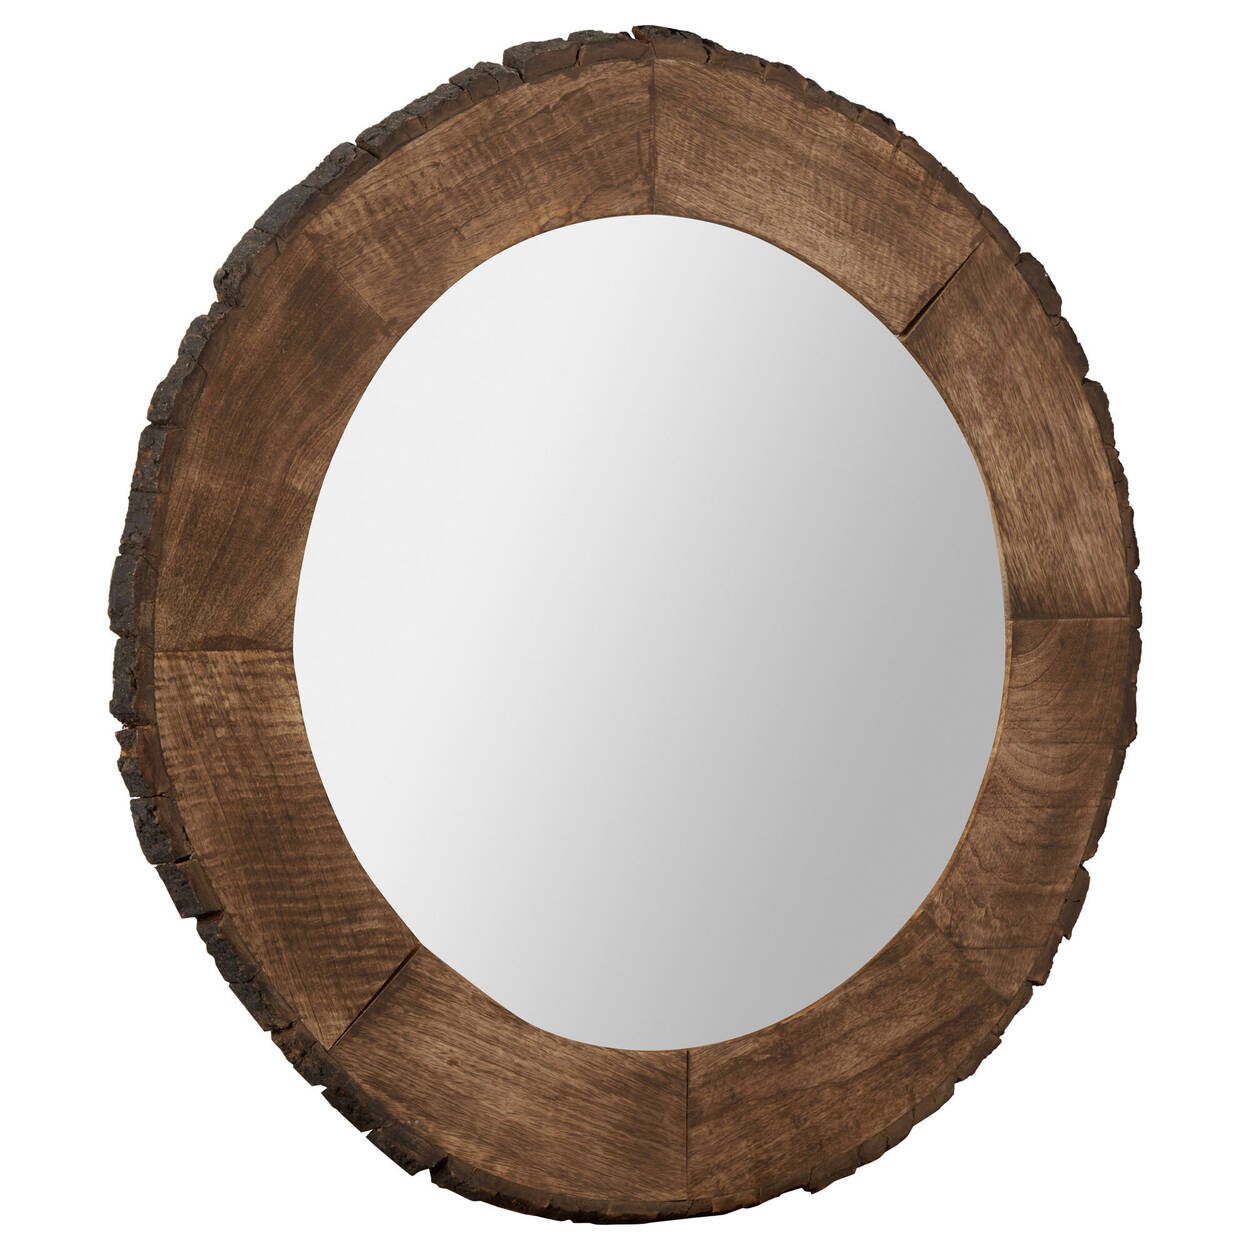 Live Edge Round Wood Mirror